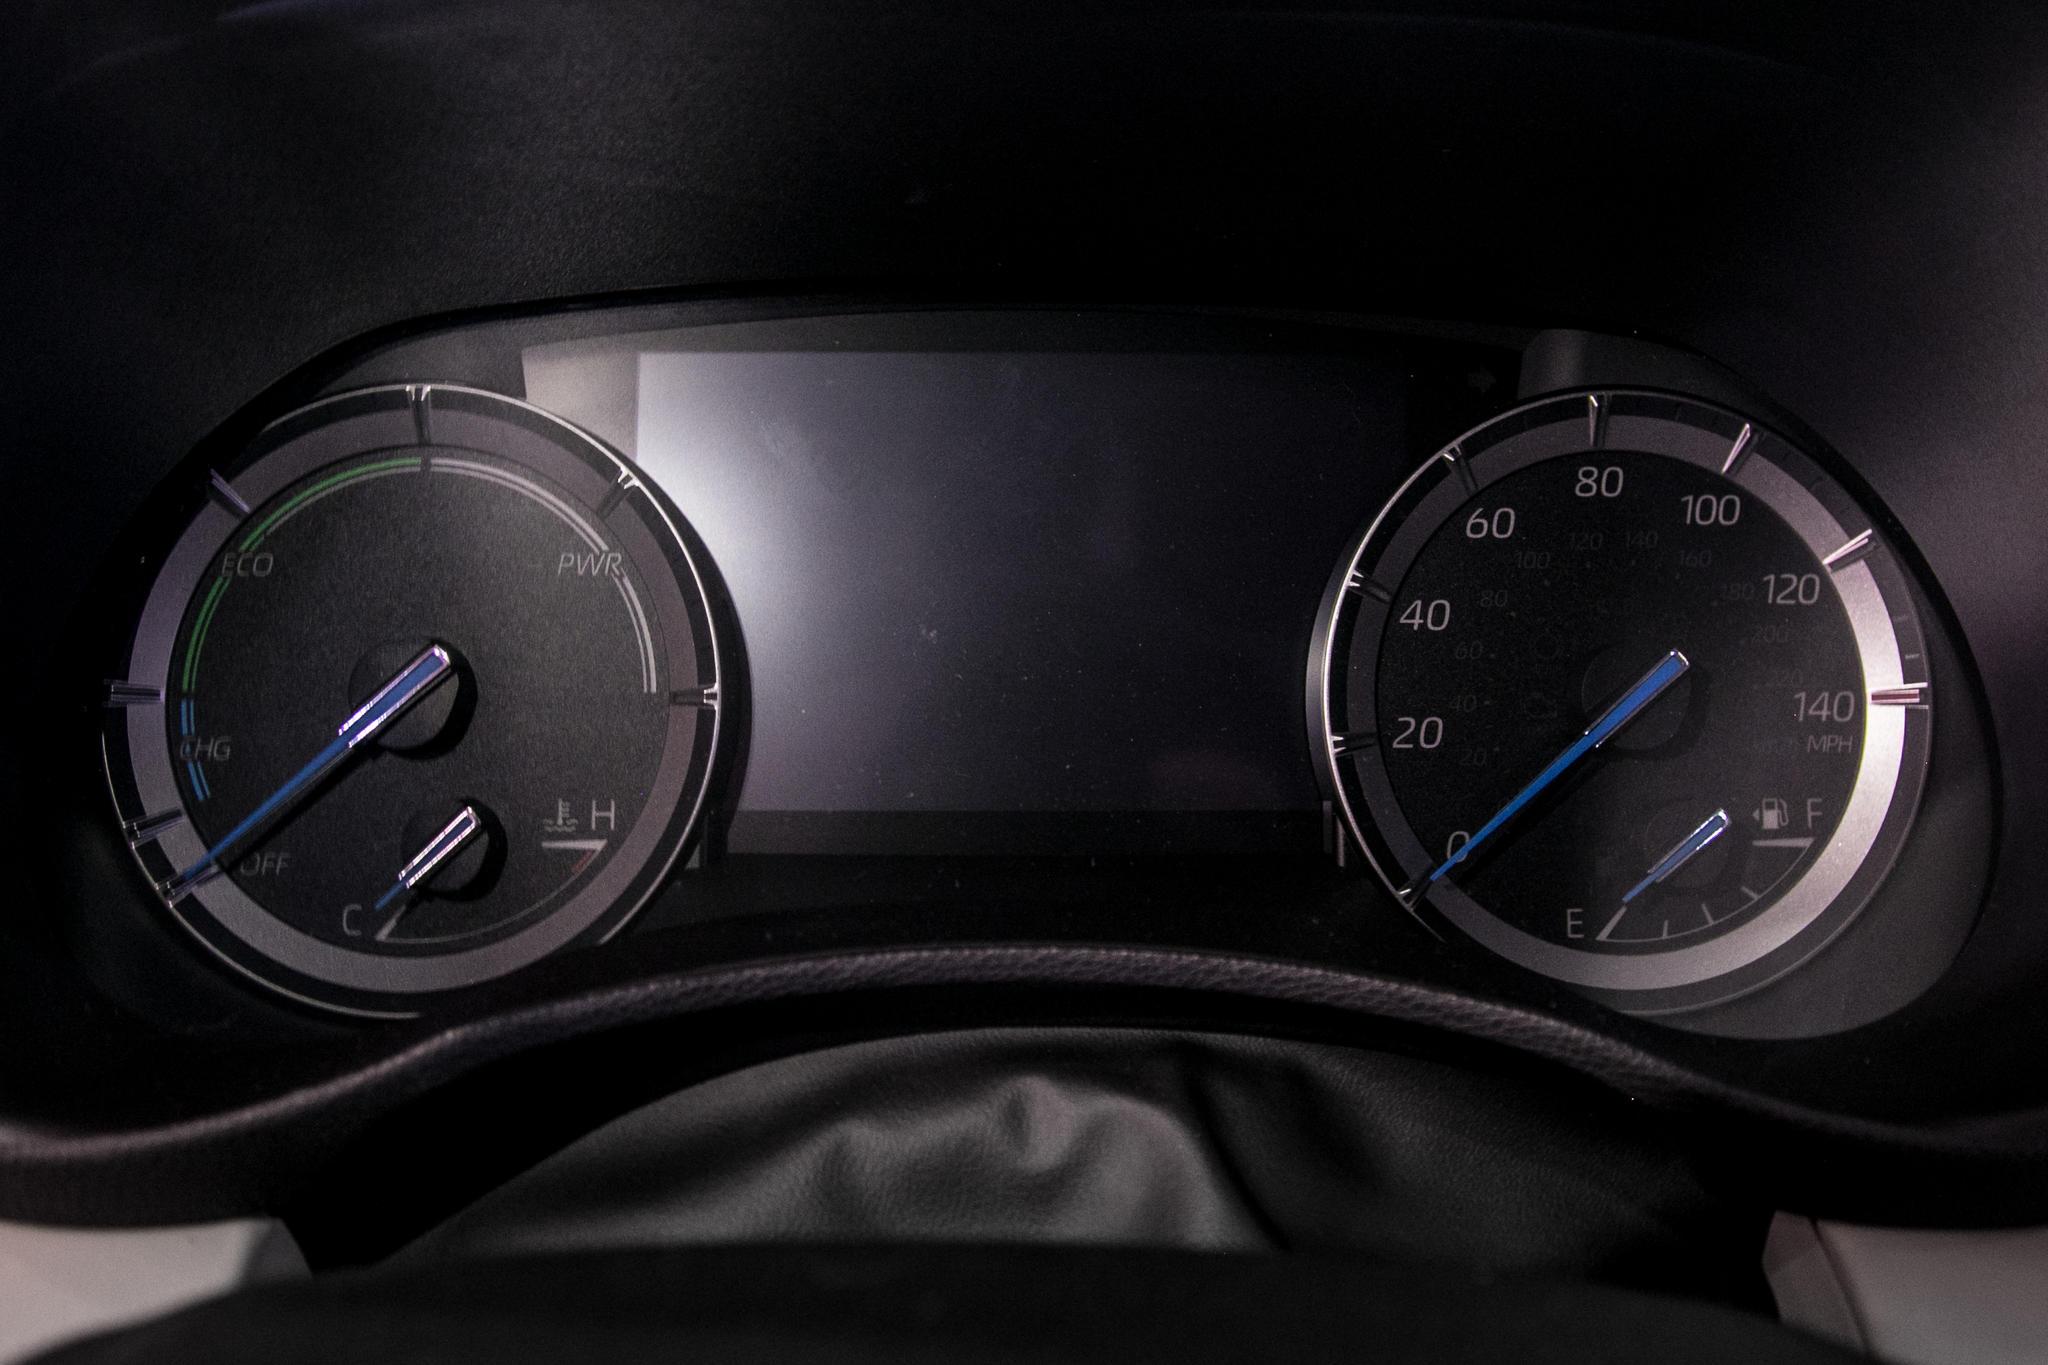 02-toyota-highlander-19-nyias-2020-front-row--instrument-panel--interior.jpg